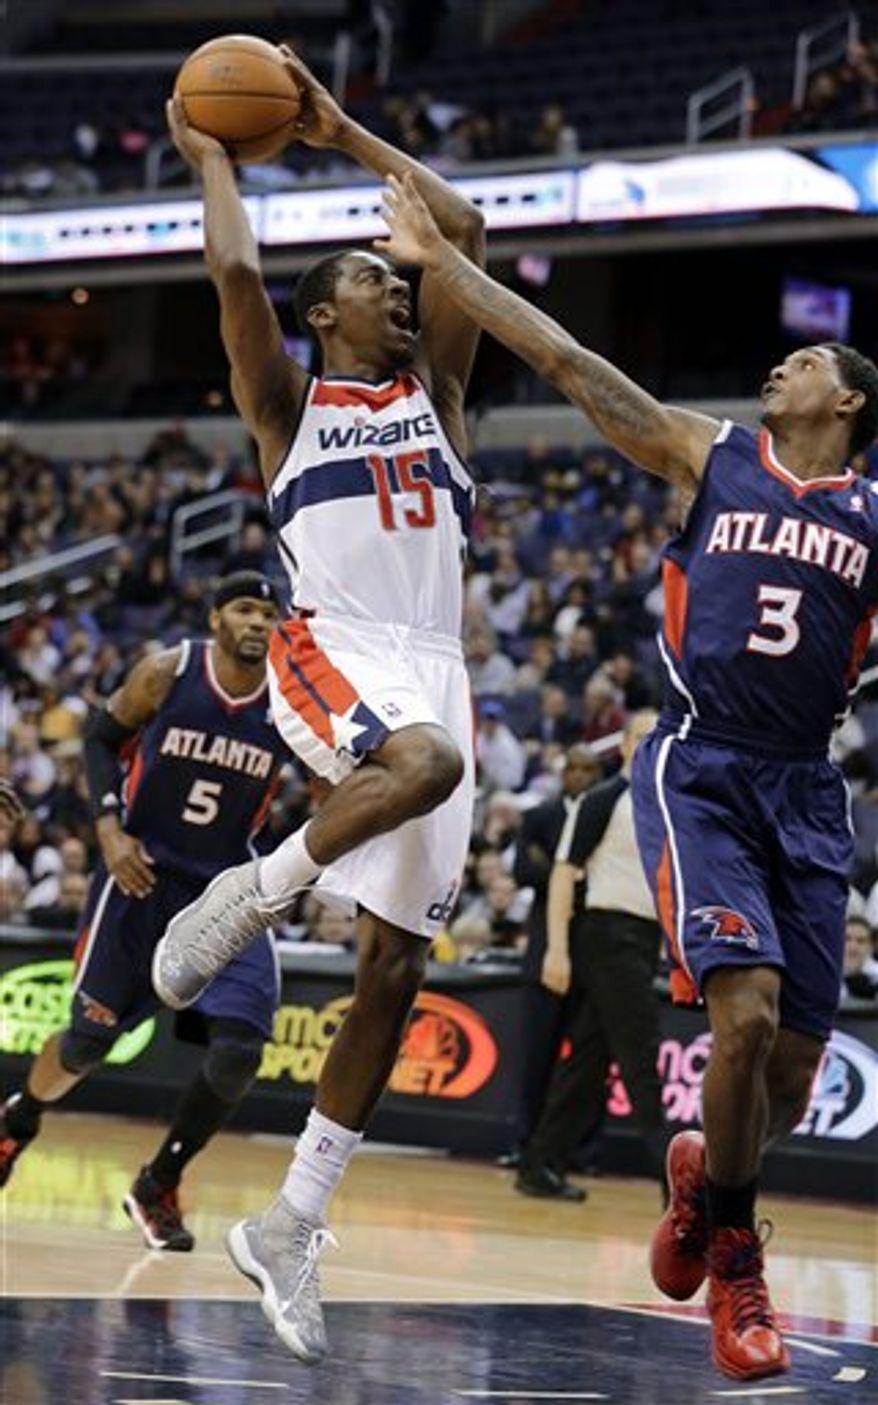 Washington Wizards guard Jordan Crawford shoots over Atlanta Hawks guard Louis Williams during overtime of an NBA basketball game Tuesday, Dec. 18, 2012, in Washington. Crawford had 27 points, but the Hawks won 100-95 in overtime. (AP Photo/Alex Brandon)